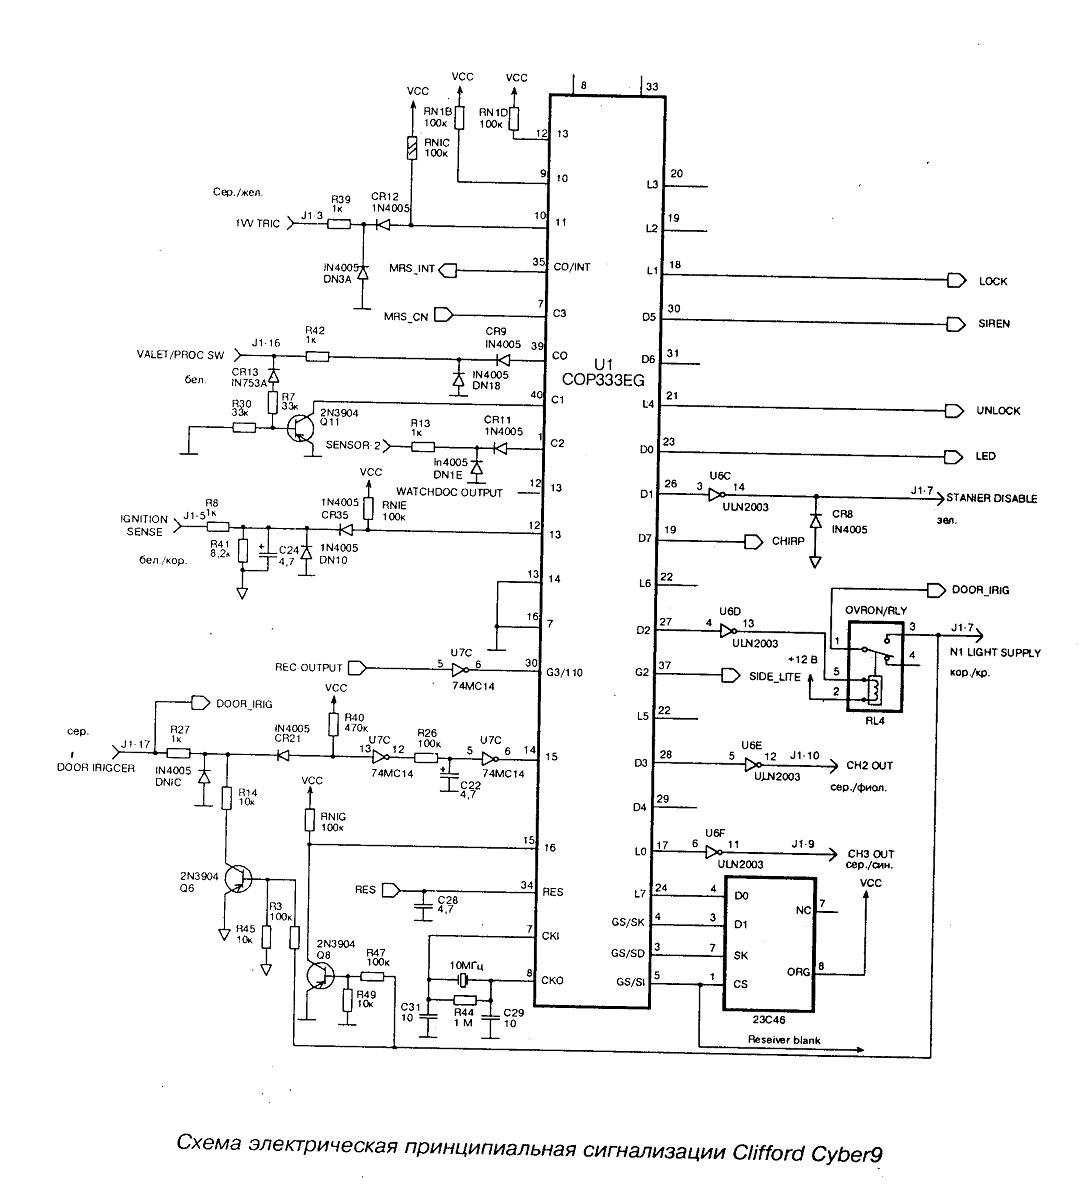 Инструкция По Установке Автосигнализации Арс 2300